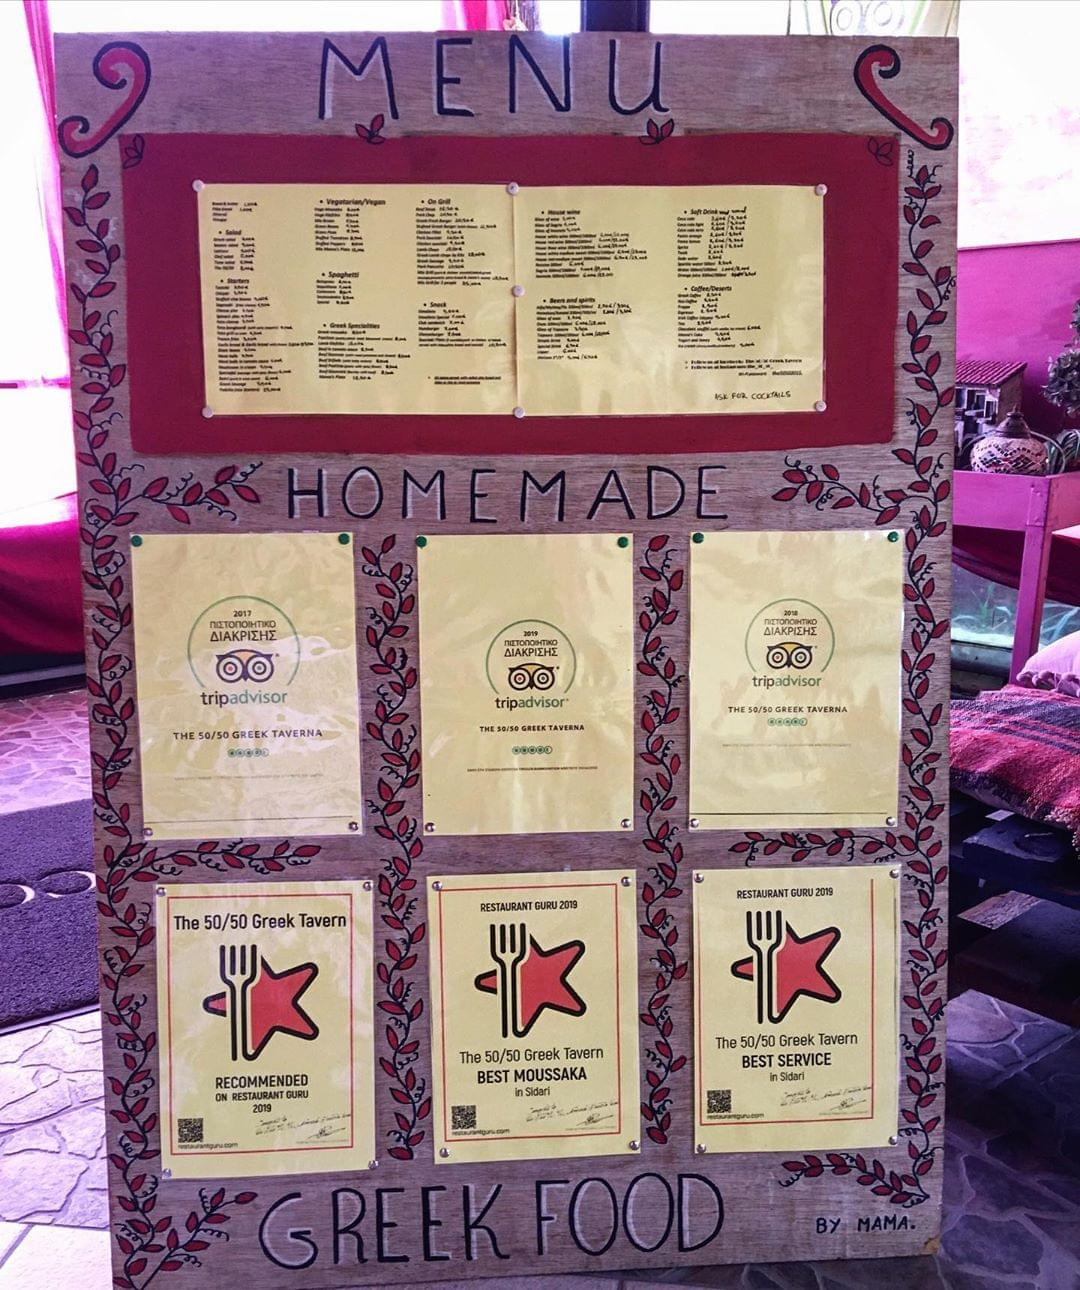 The 50/50 Greek Tavern award